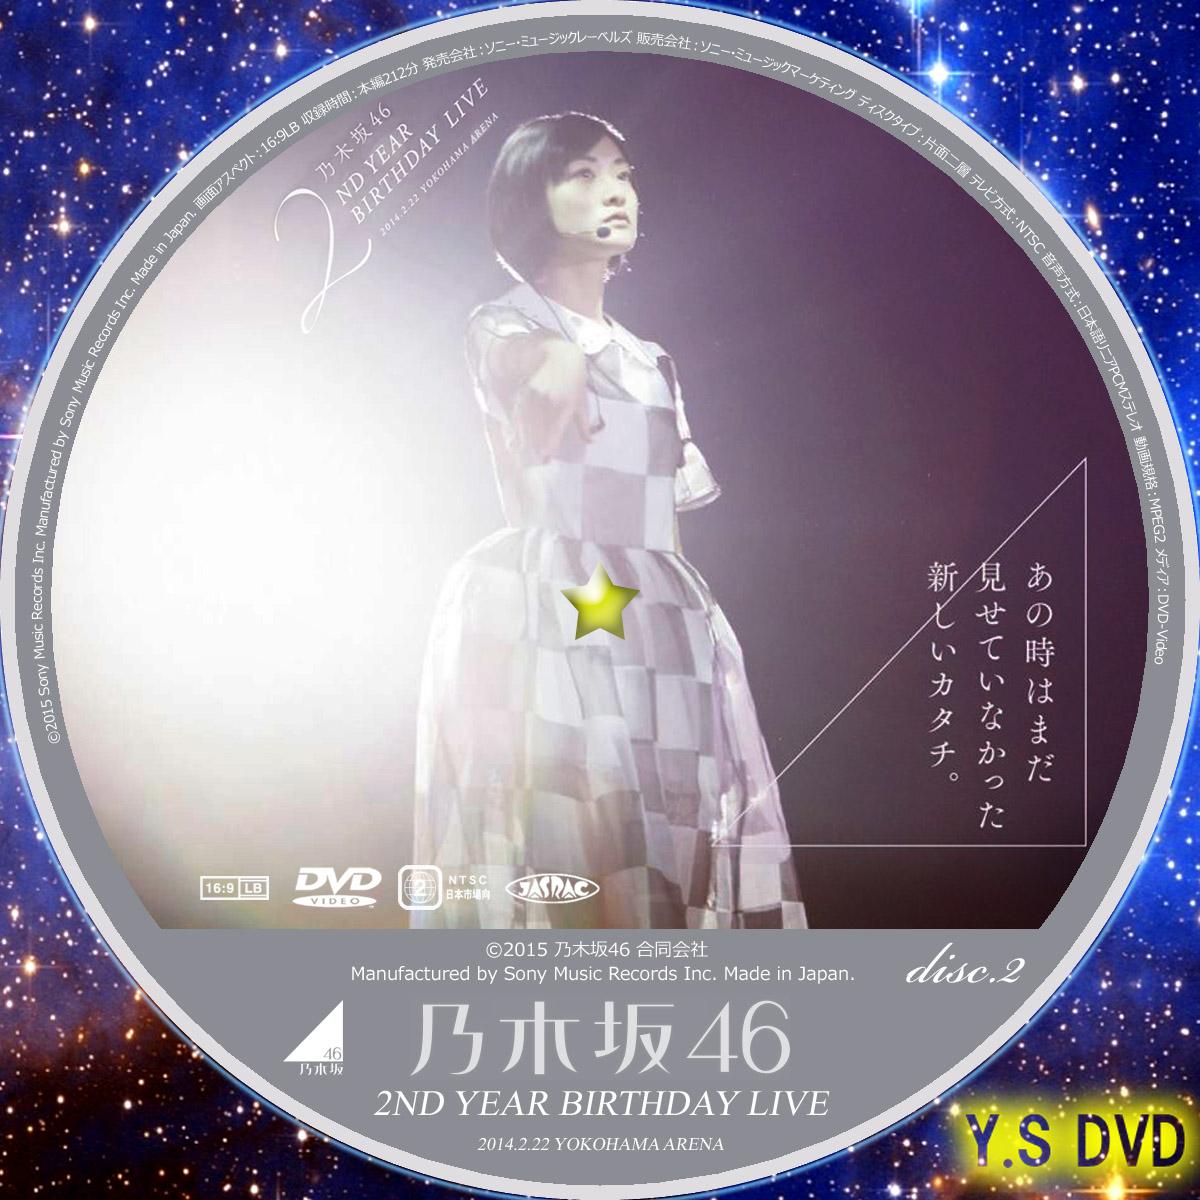 乃木坂46 8th year birthday live dvd